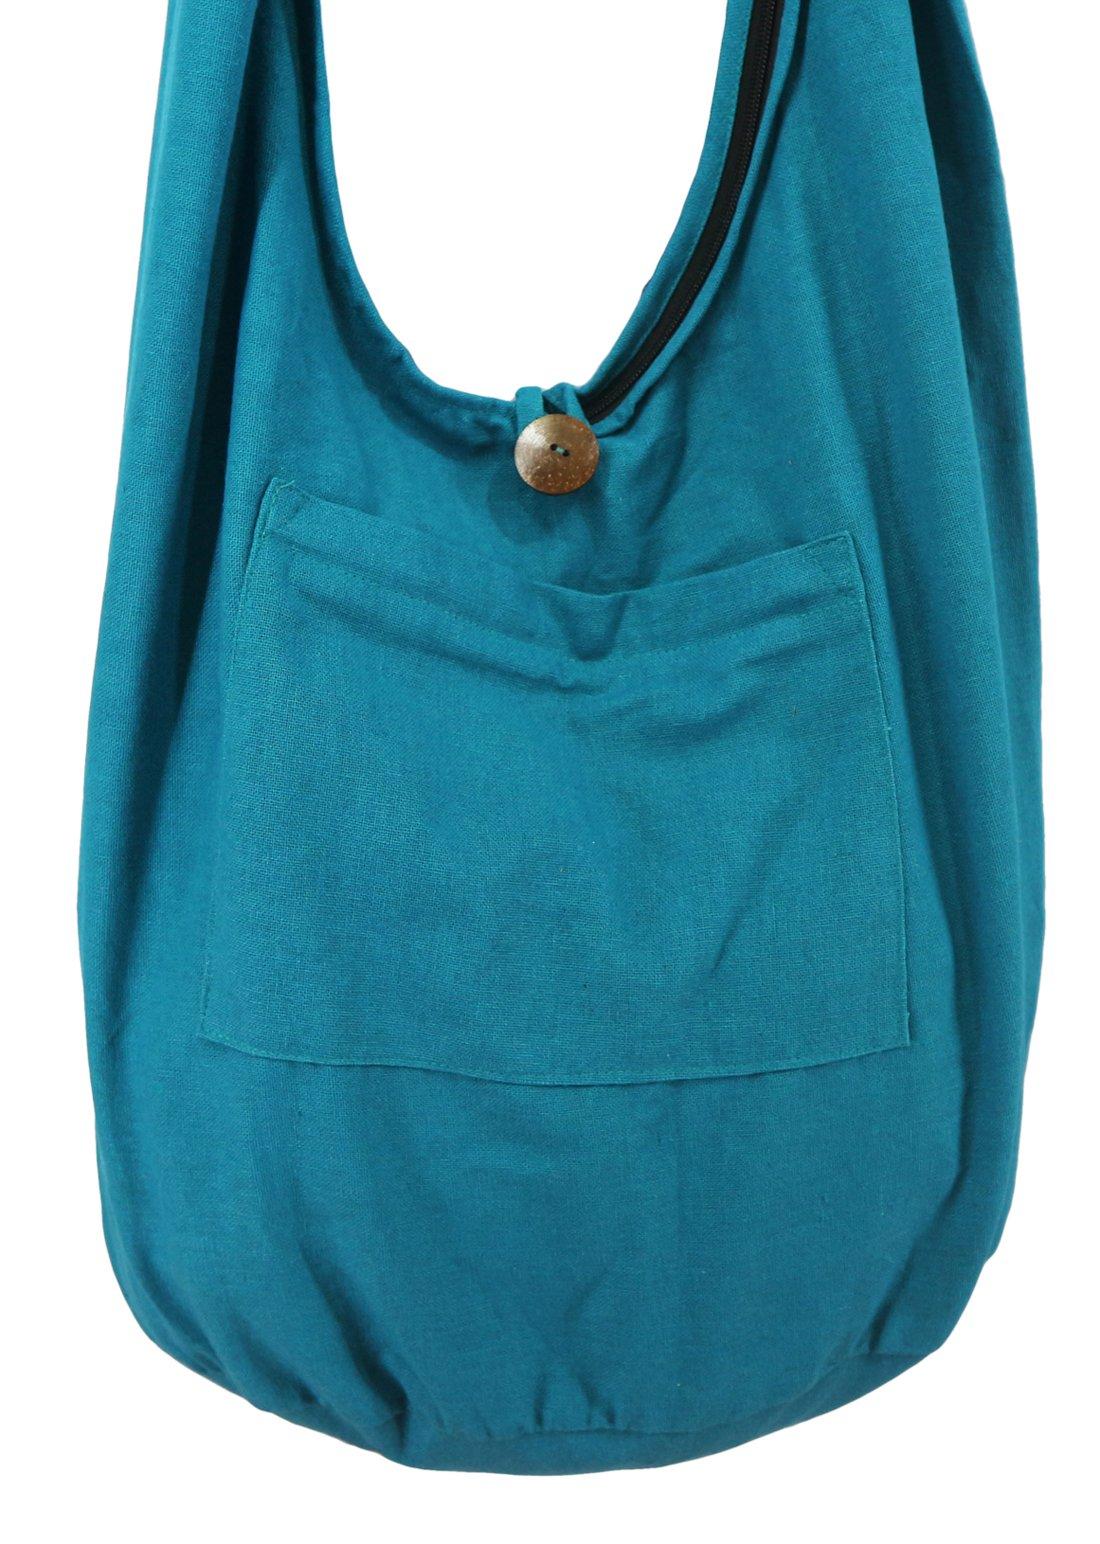 Lovely Creations's Thai Monk Buddha Cotton Sling Crossbody Messenger Bag Purse Hippie Hobo Shoulder Bag (Solid Ocean blue)